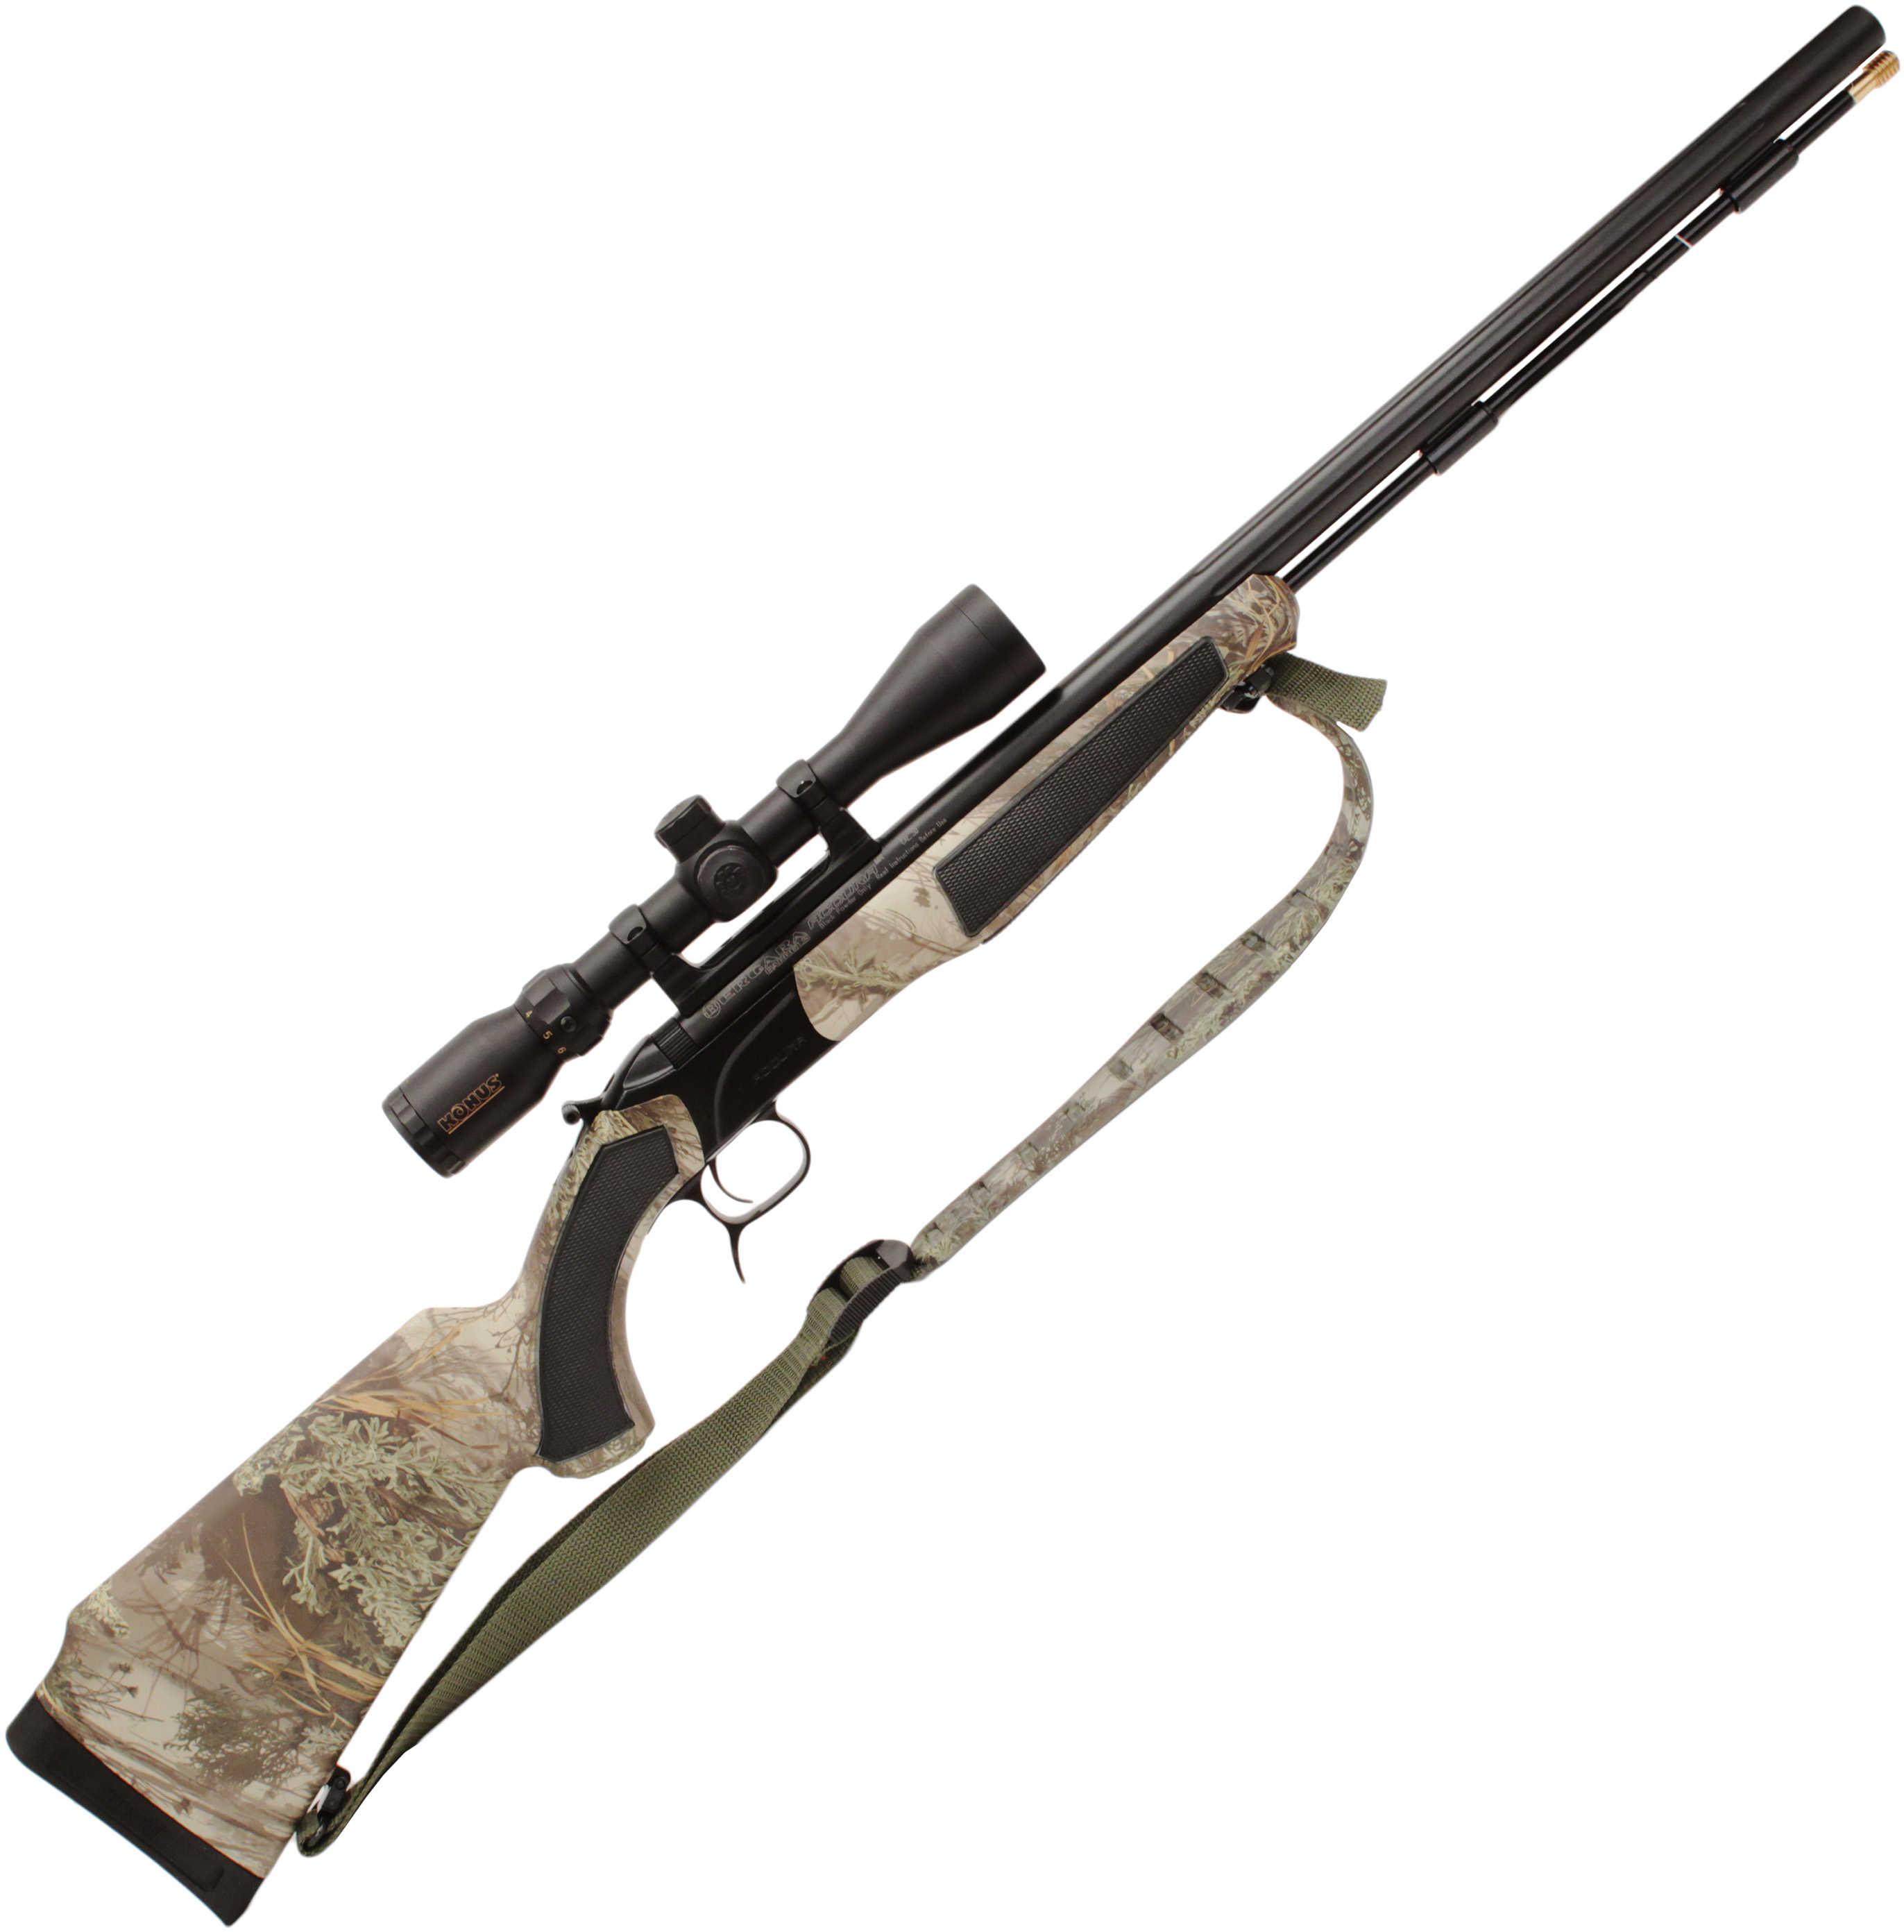 CVA Accura MR .50 Caliber Muzzleloader Rifle Stainless Steel Nitride/Max 1 HD, Konus 3-9x40IR Md: PR3121 PR3121SNSC